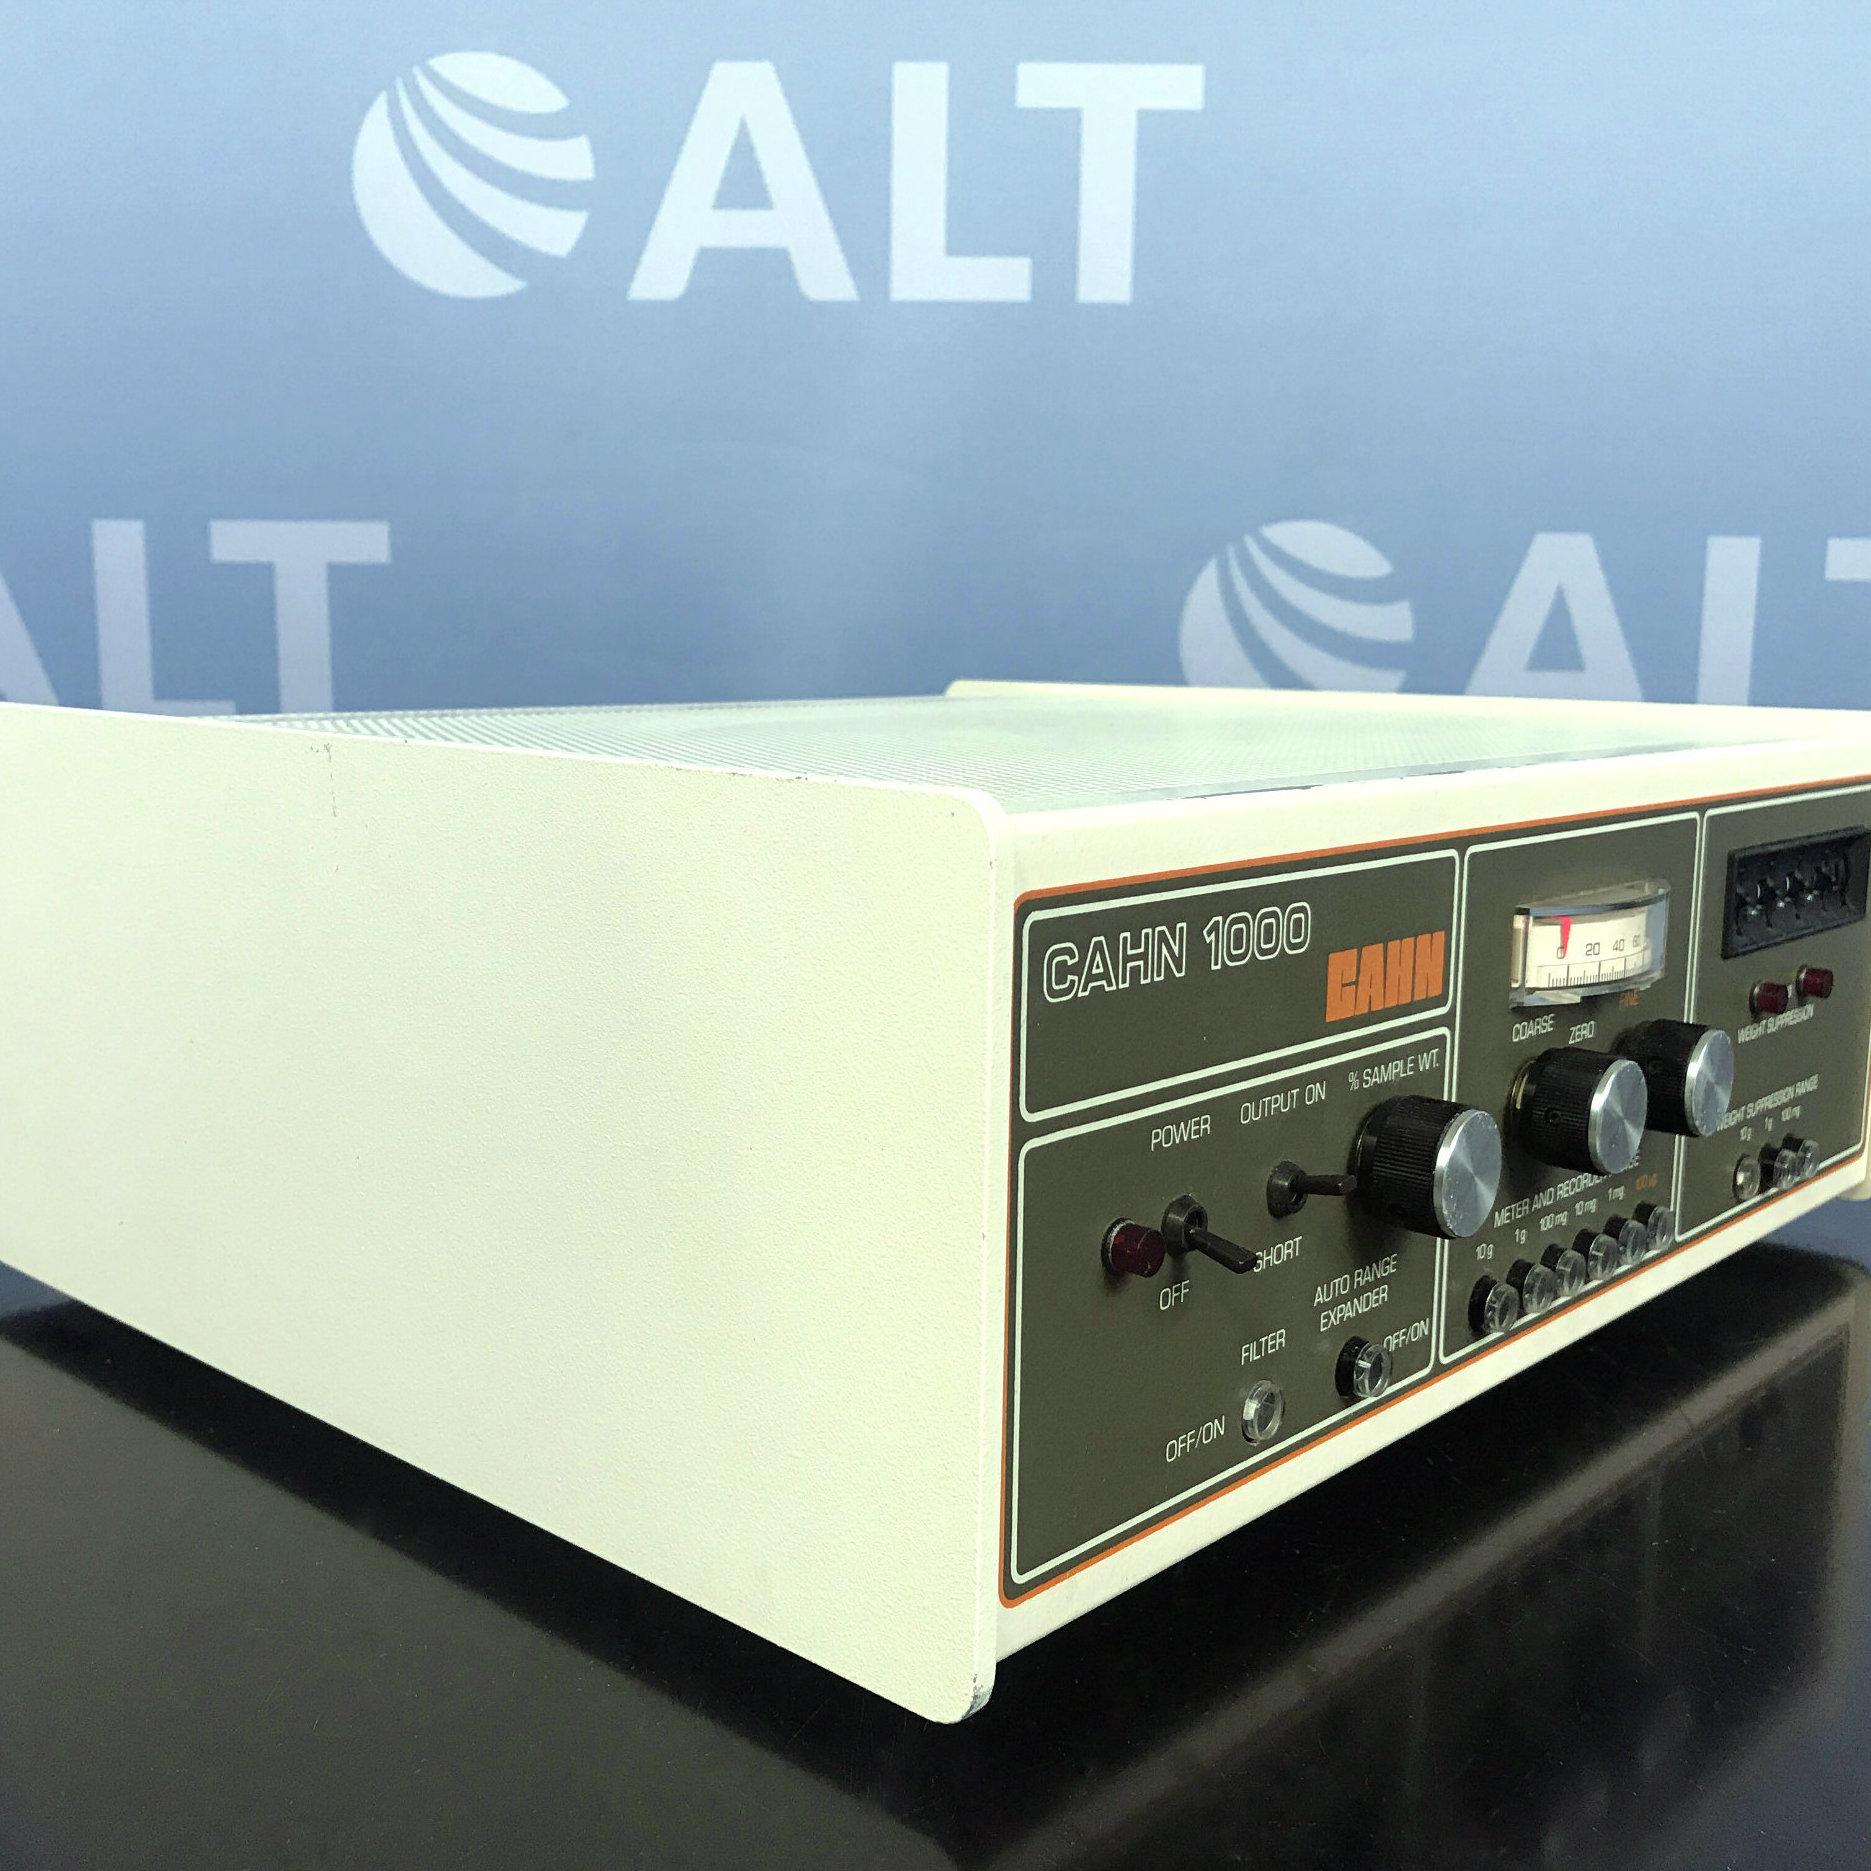 Cahn 1000 Microelectronic Balance  Image